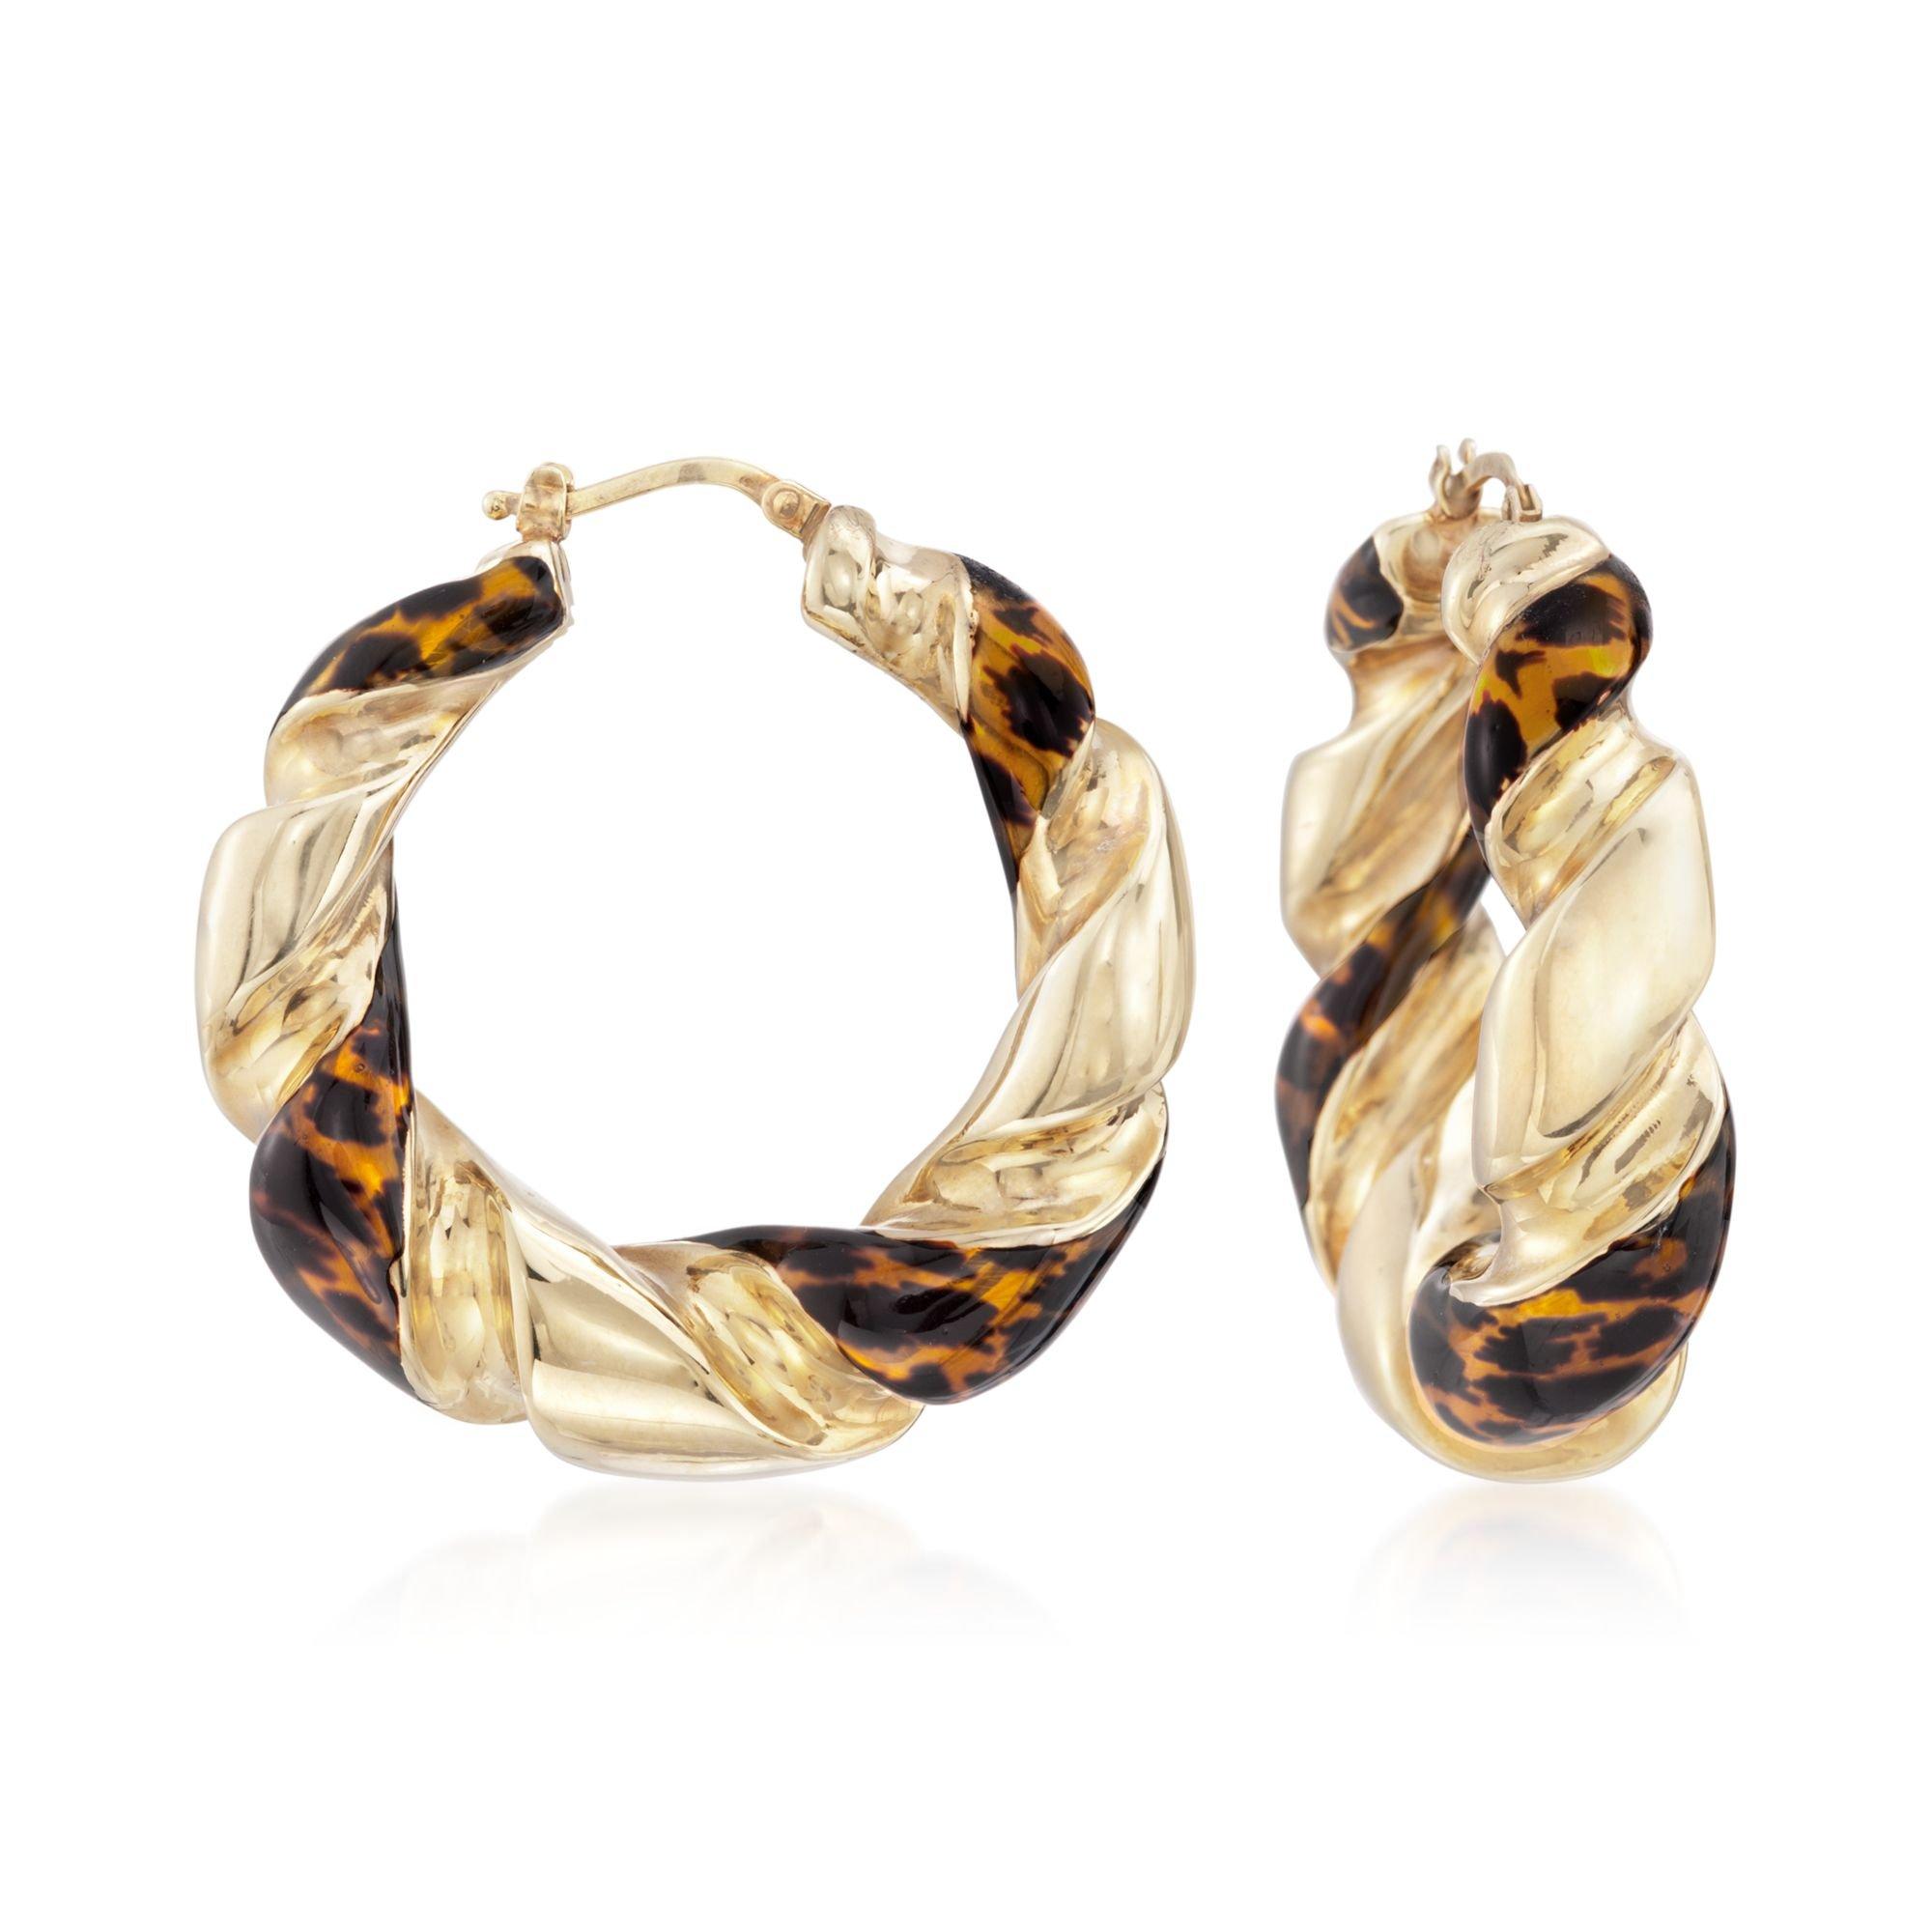 Ross-Simons Italian 18kt Yellow Gold Over Sterling Hoop Earrings with Leopard Enamel